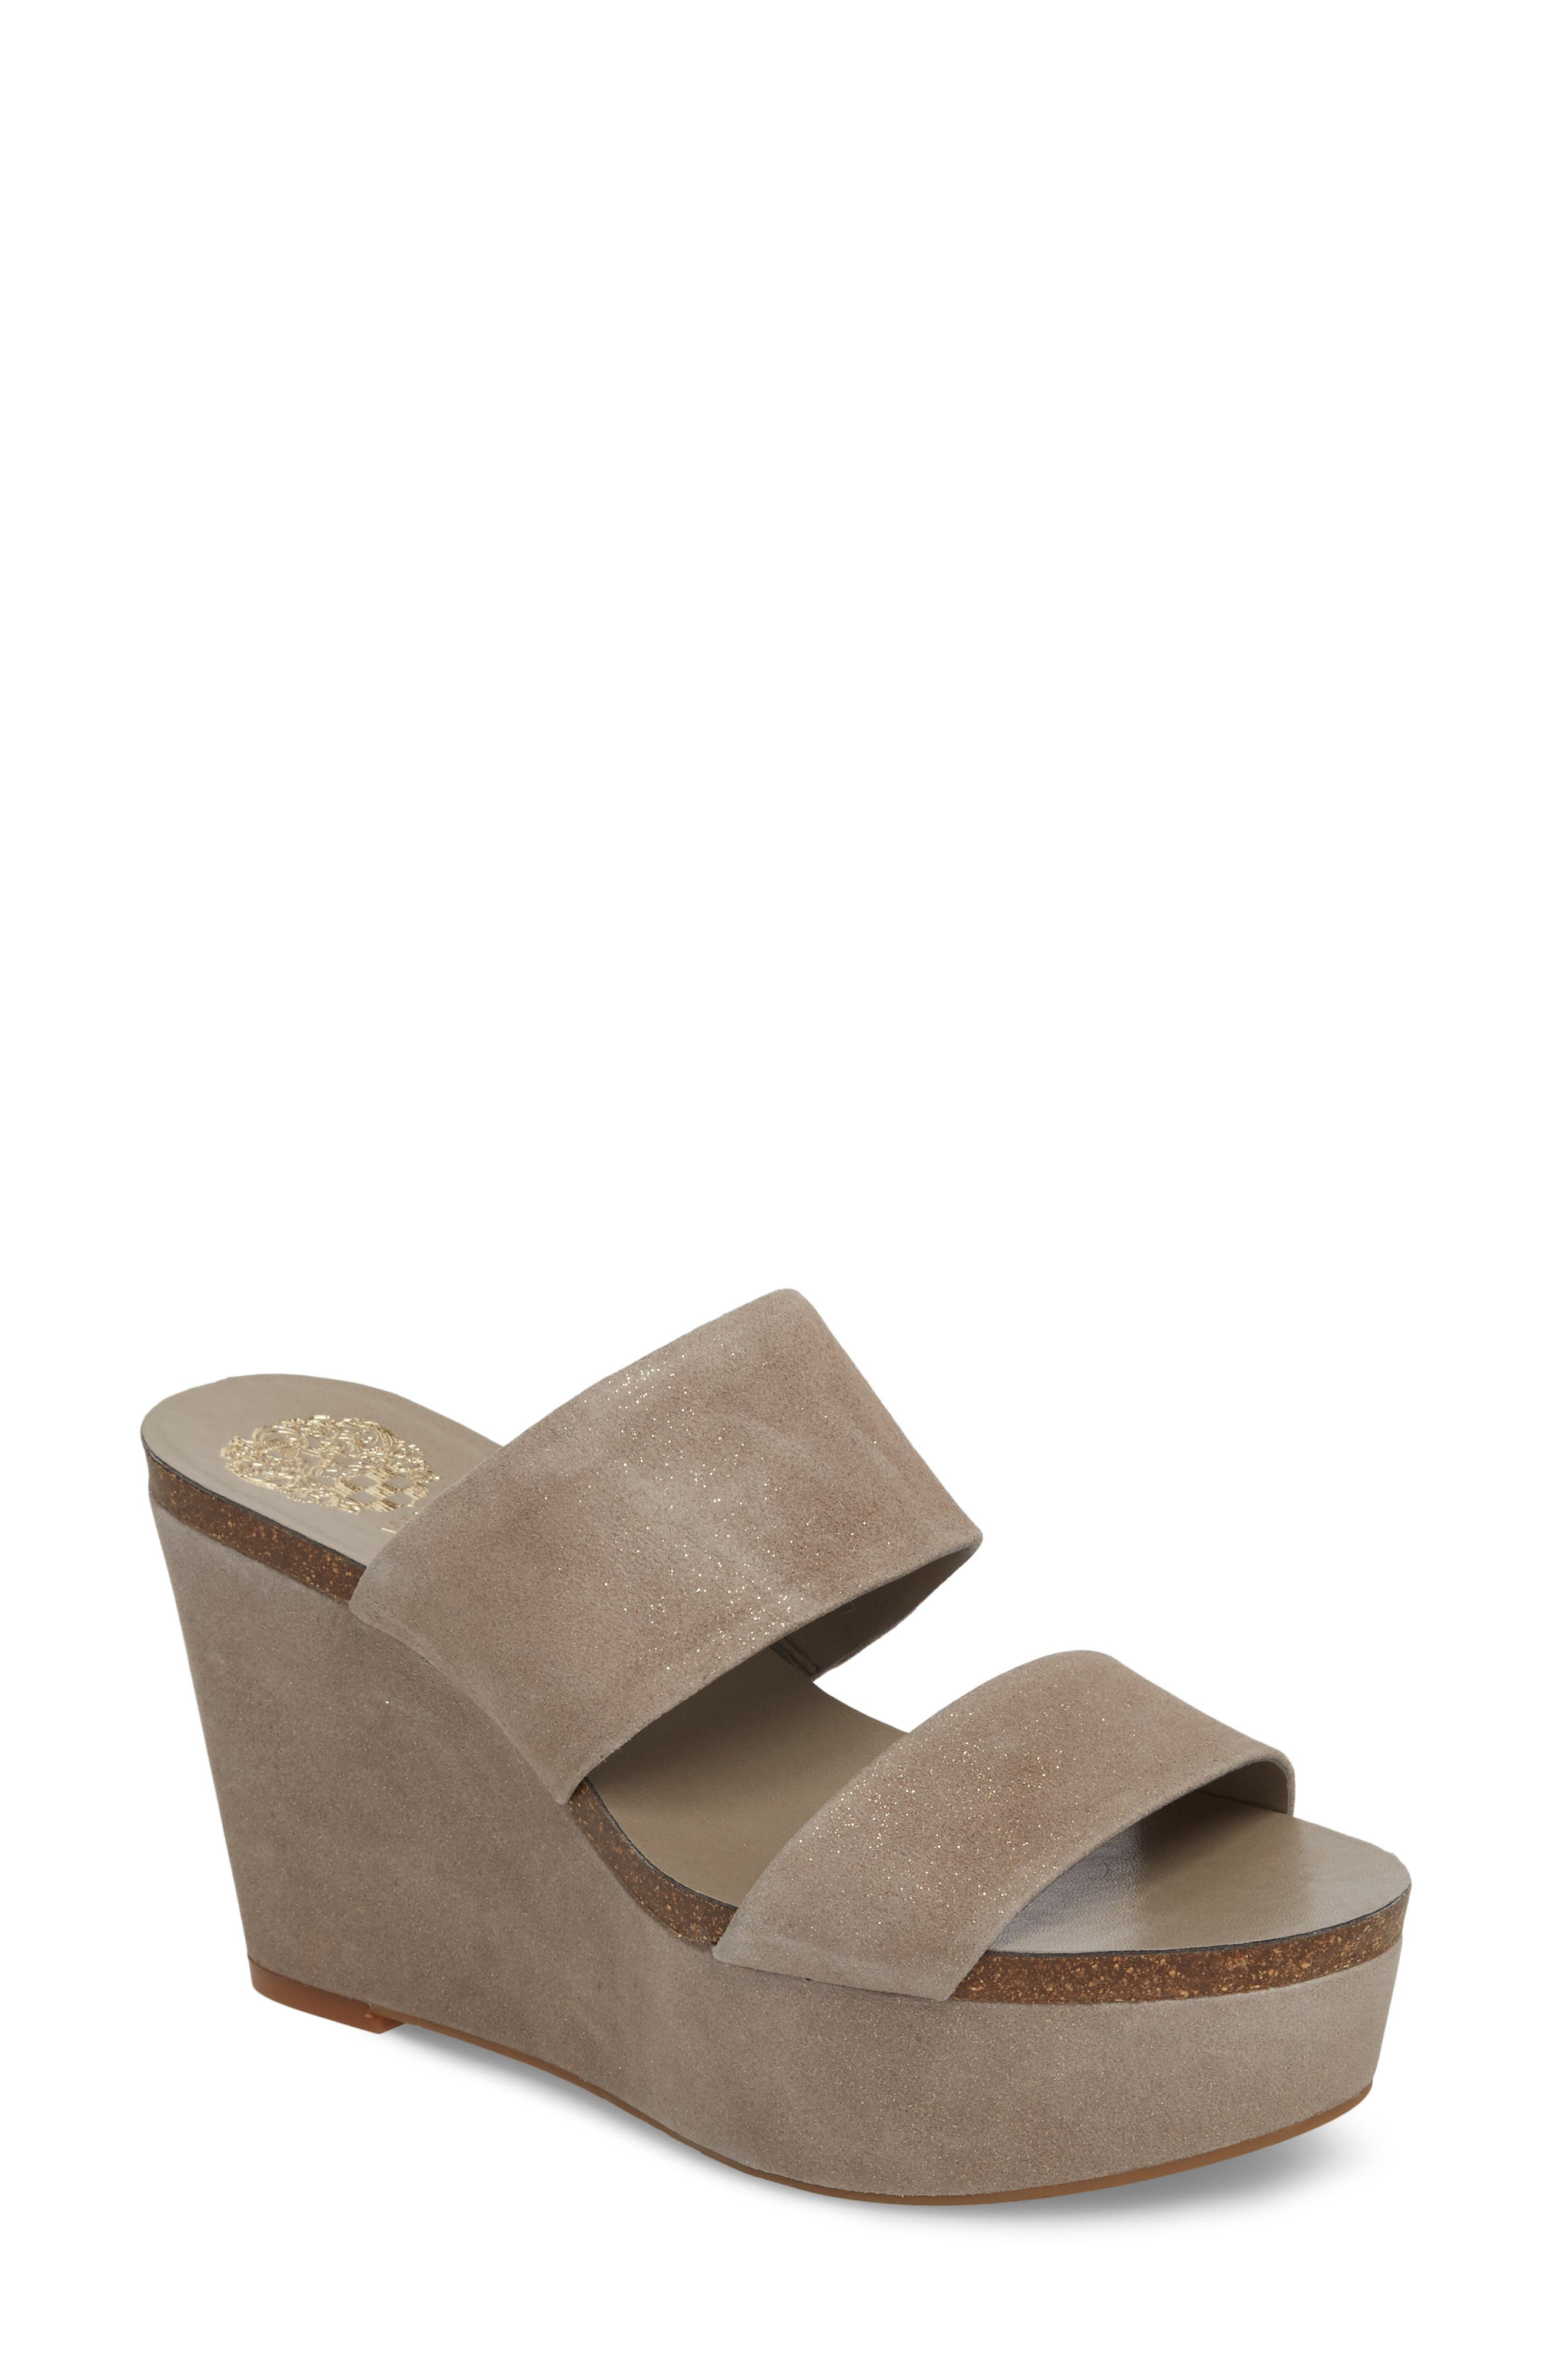 Varenia Platform Wedge Sandal,                             Main thumbnail 1, color,                             SILVER GREY FABRIC